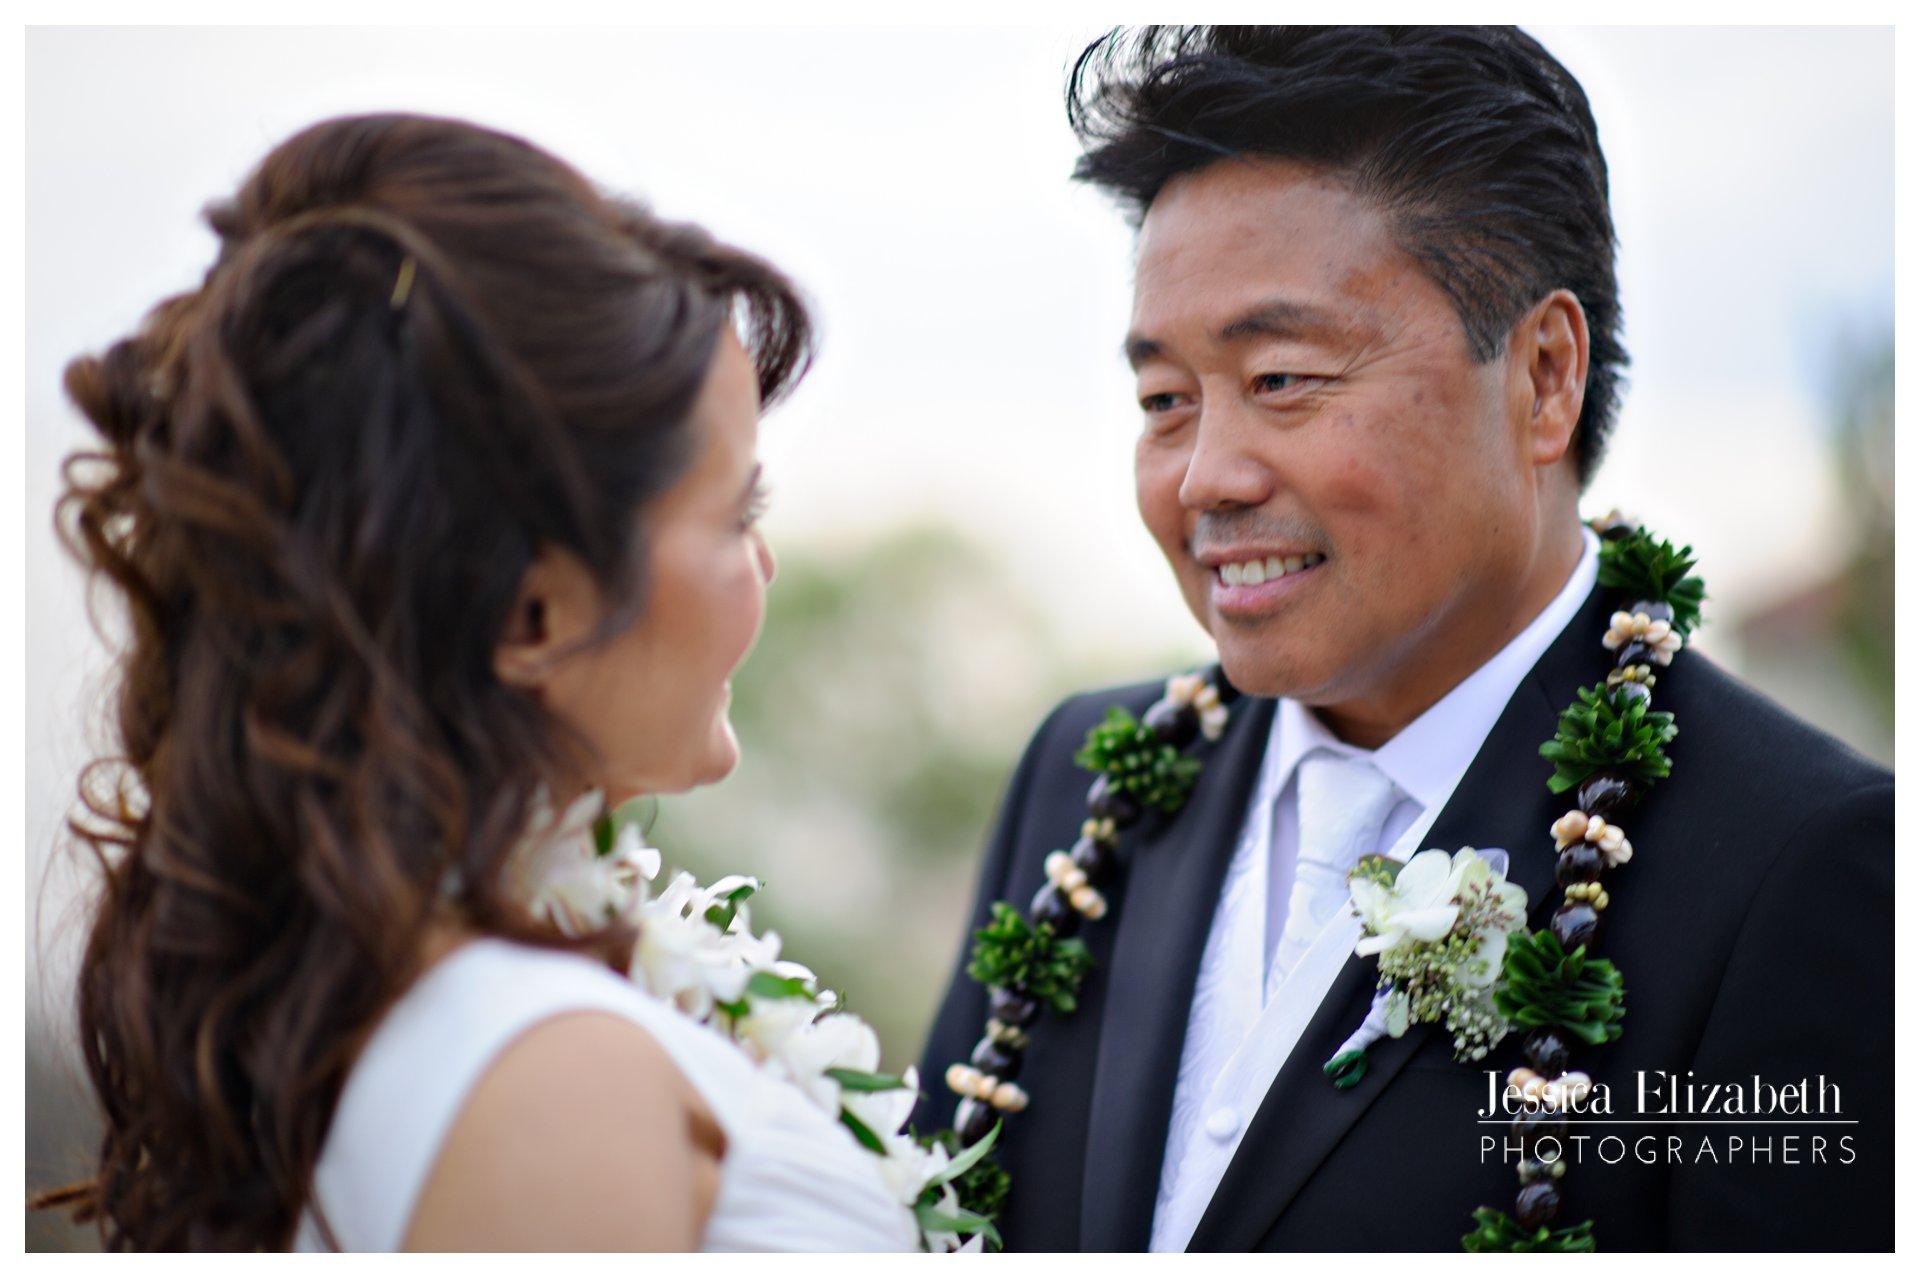 30-Terranea-Palos-Verdes-Wedding-Photography-by-Jessica-Elizabeth-w.jpg